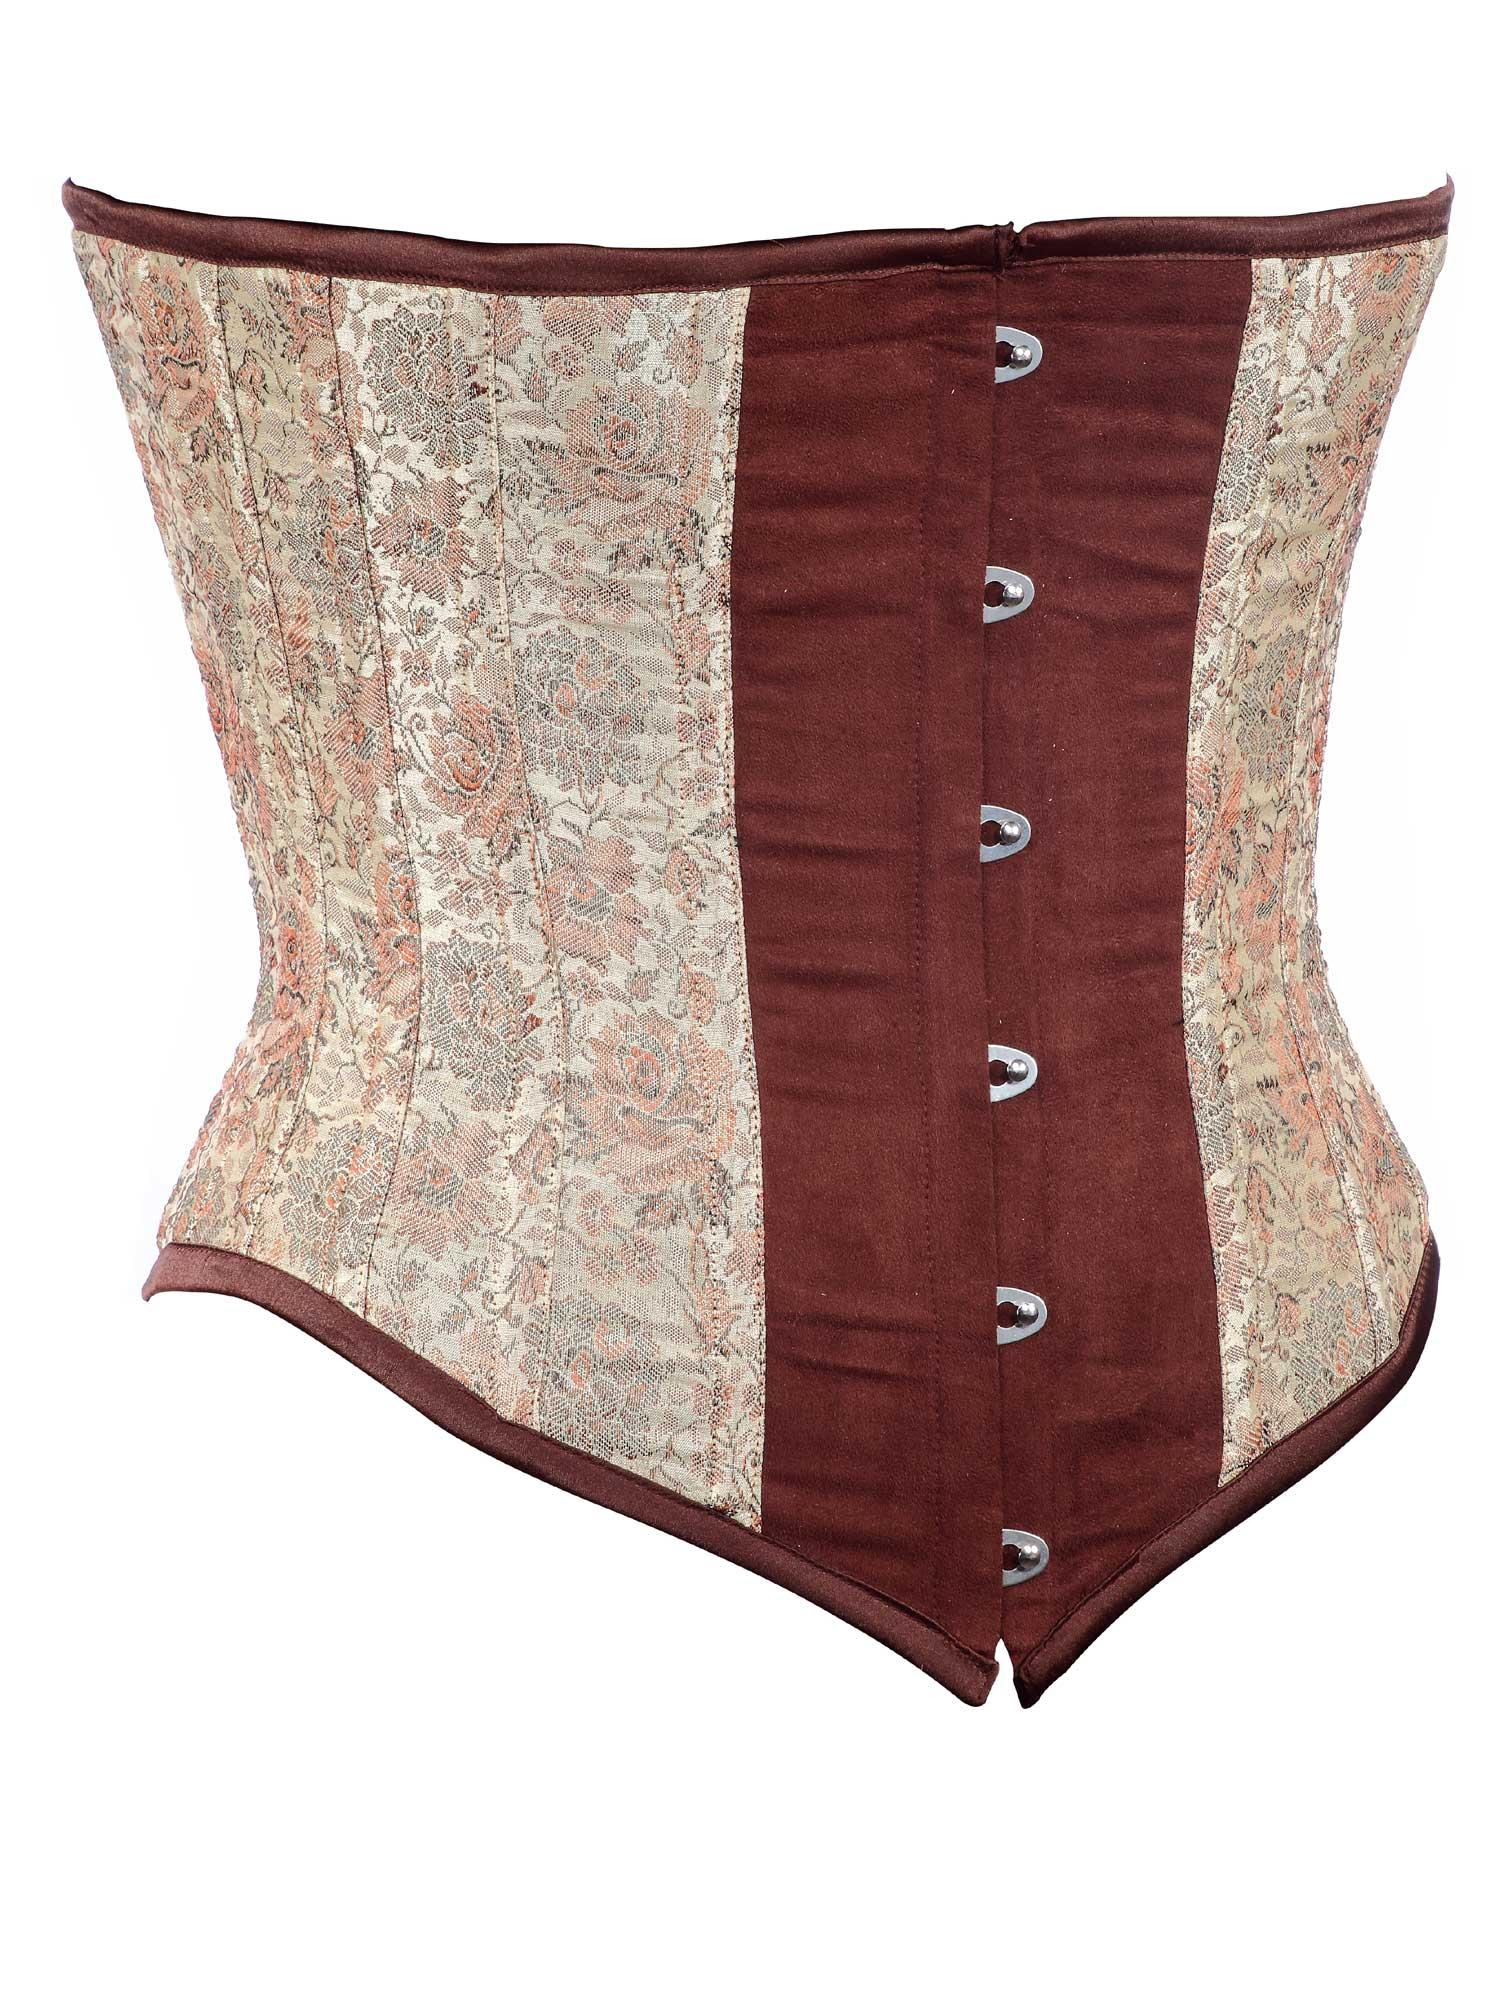 chocolate_suede_cream_brocade_fabric_steel_boning_underbust_corset_waist_cincher_bustier_bustiers_and_corsets_4.jpg